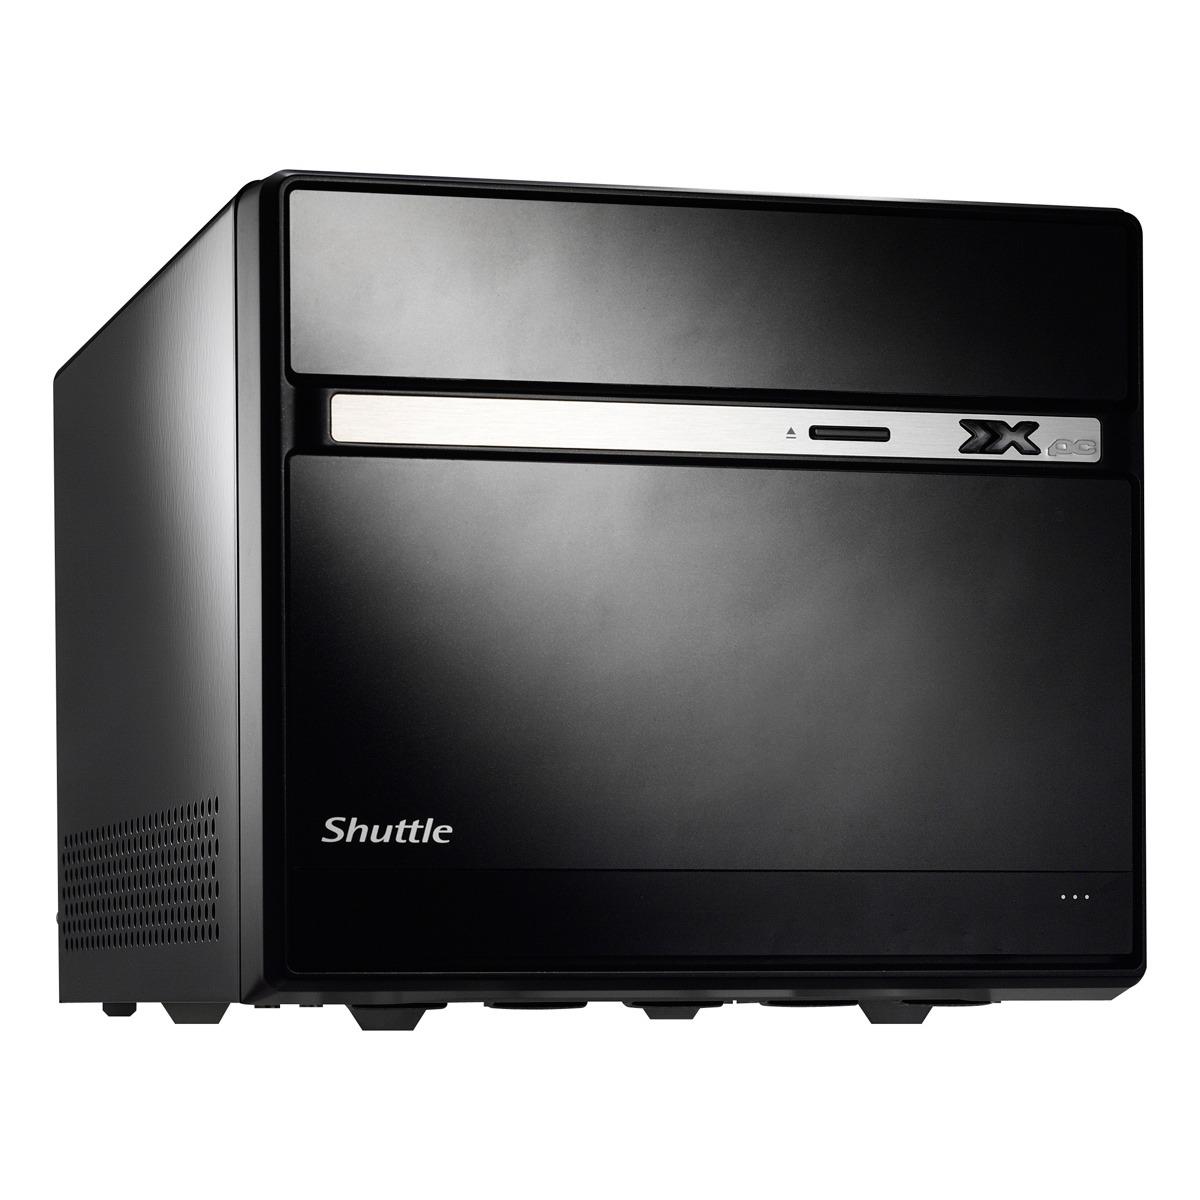 Barebone PC Shuttle XPC Barebone SH55J2 Shuttle SH55J2 - Mini-Barebone (Intel H55 Express)